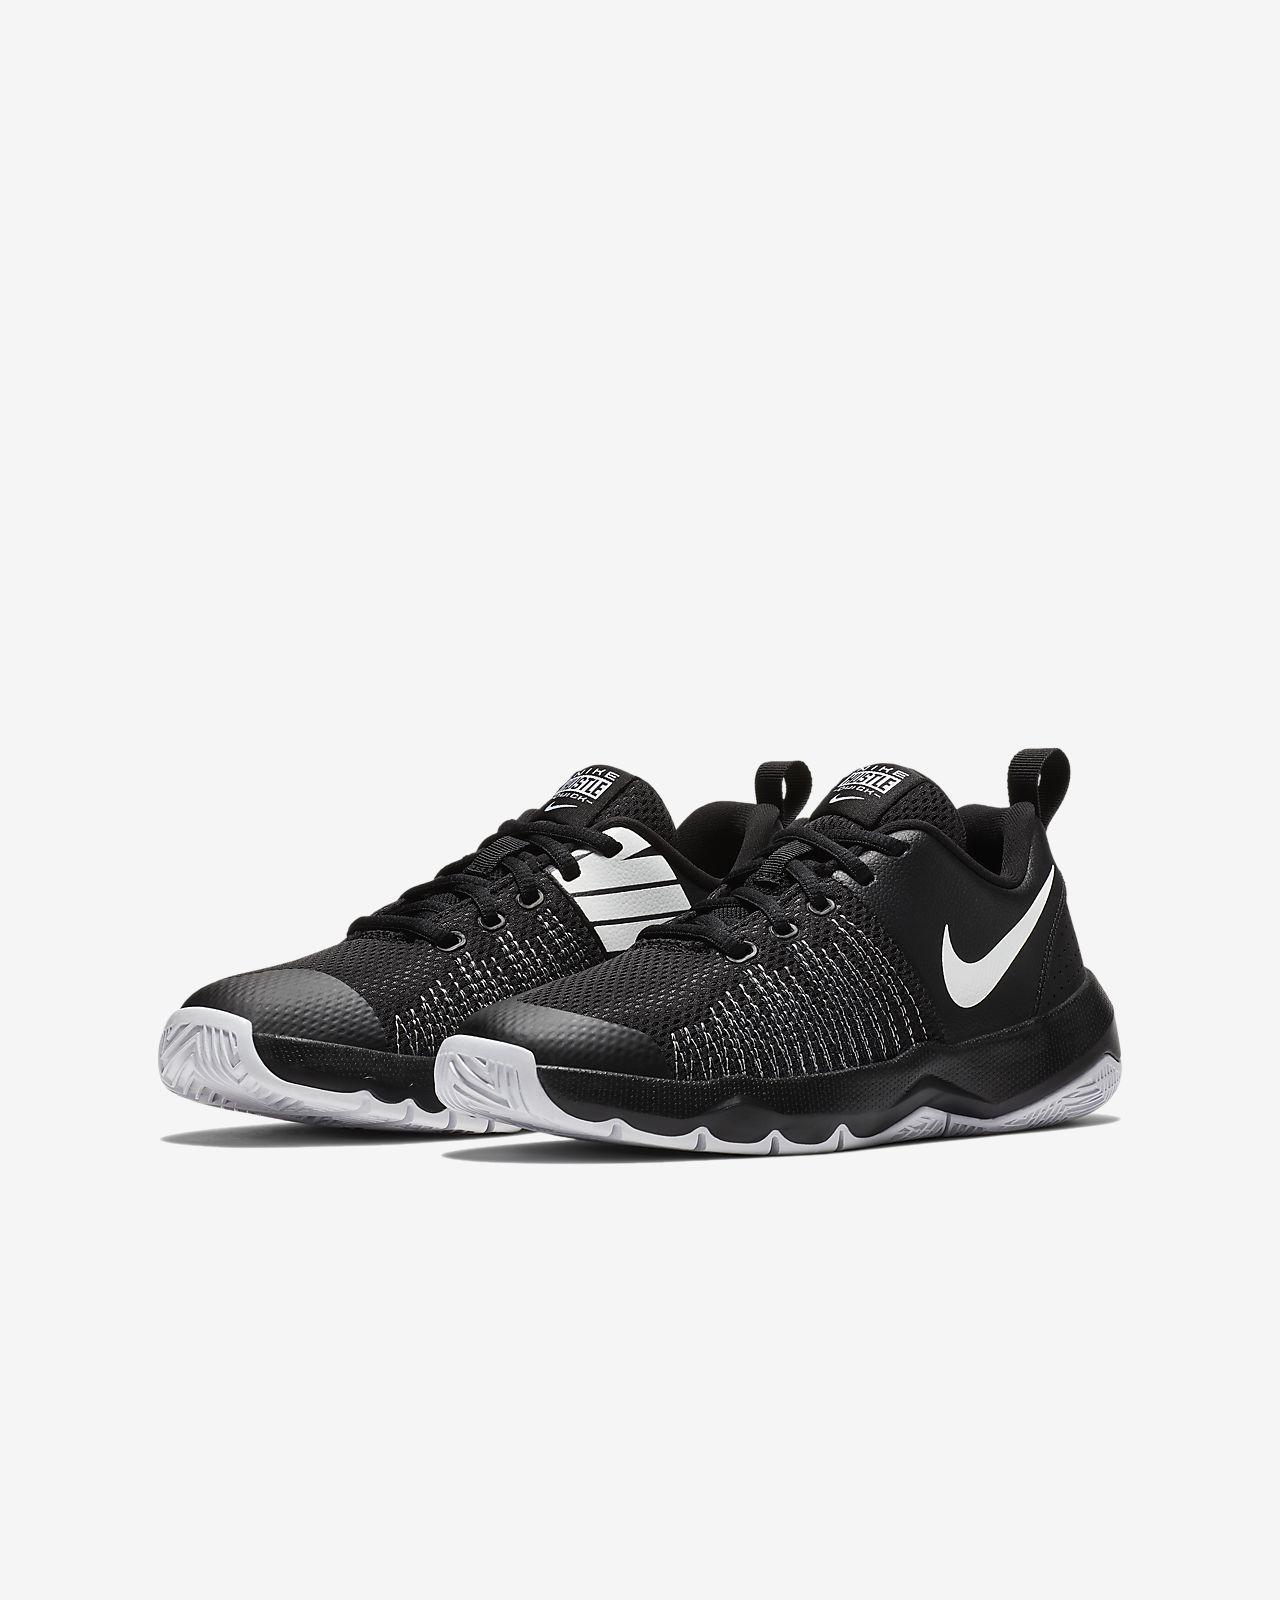 8635b30bdaf6e Nike Team Hustle Quick Older Kids' Basketball Shoe